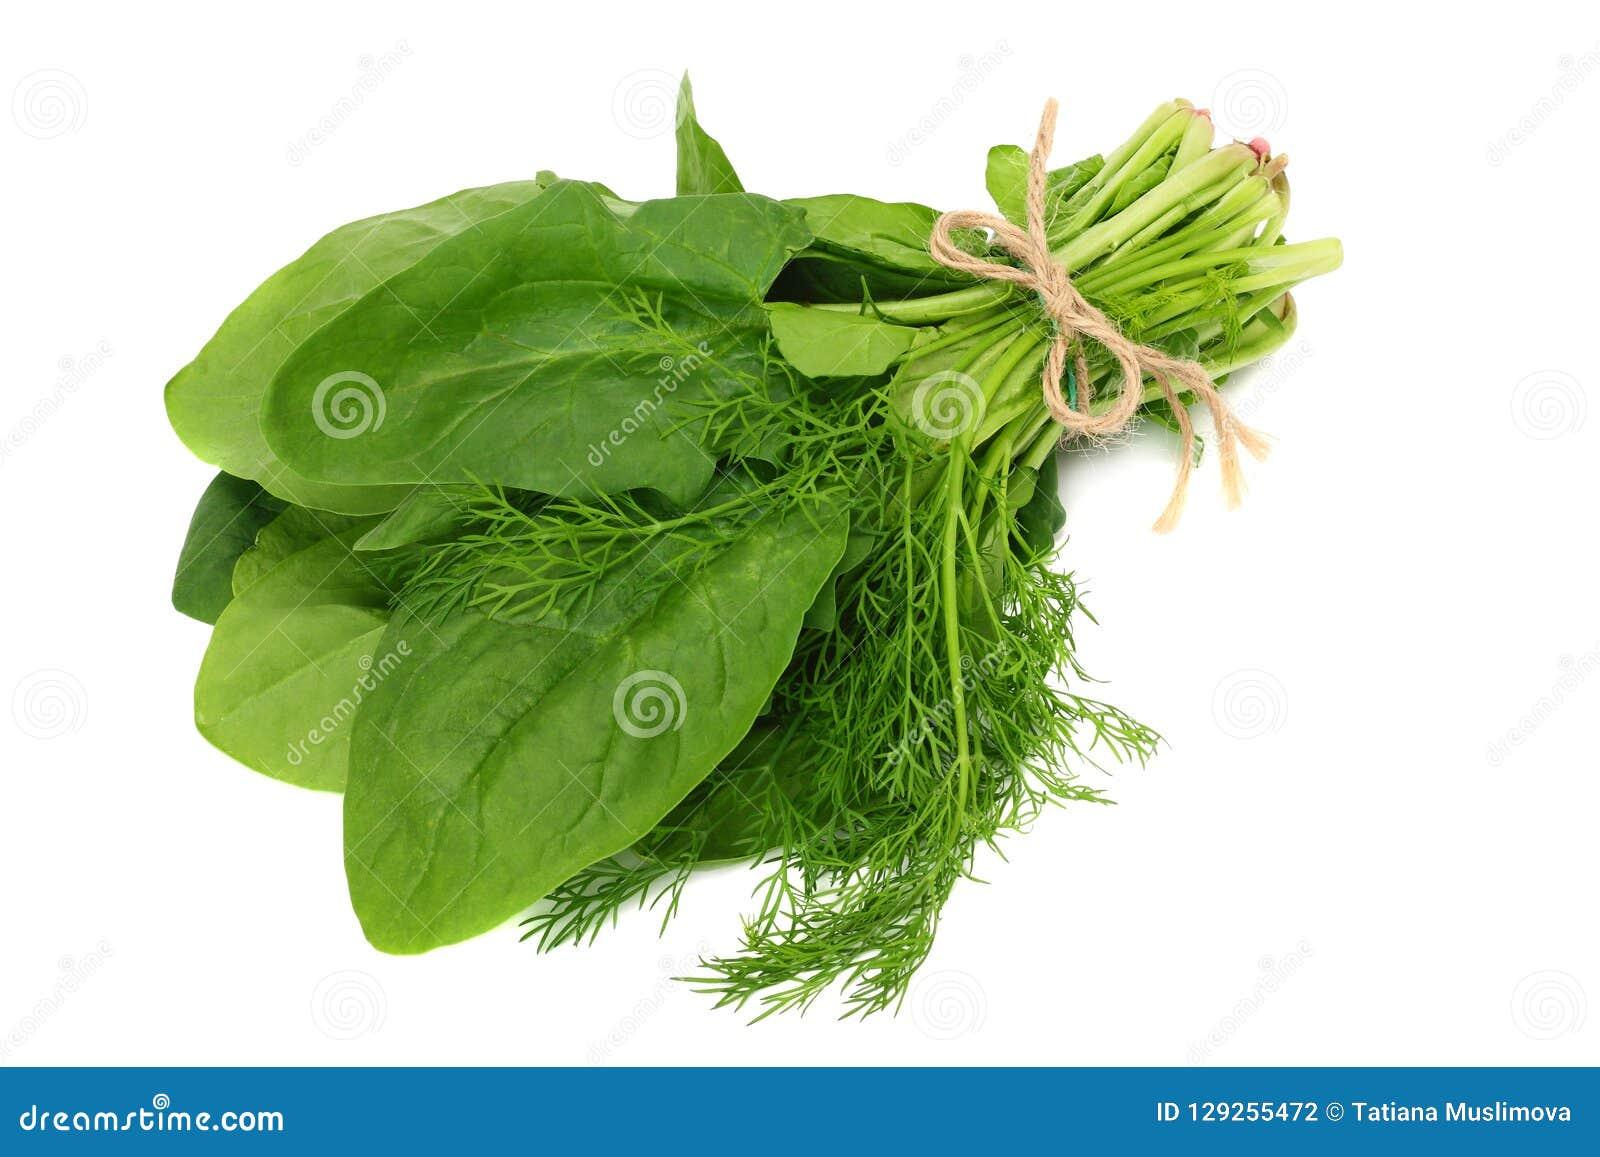 Spenatsidaisolat på vit bakgrund sund mat